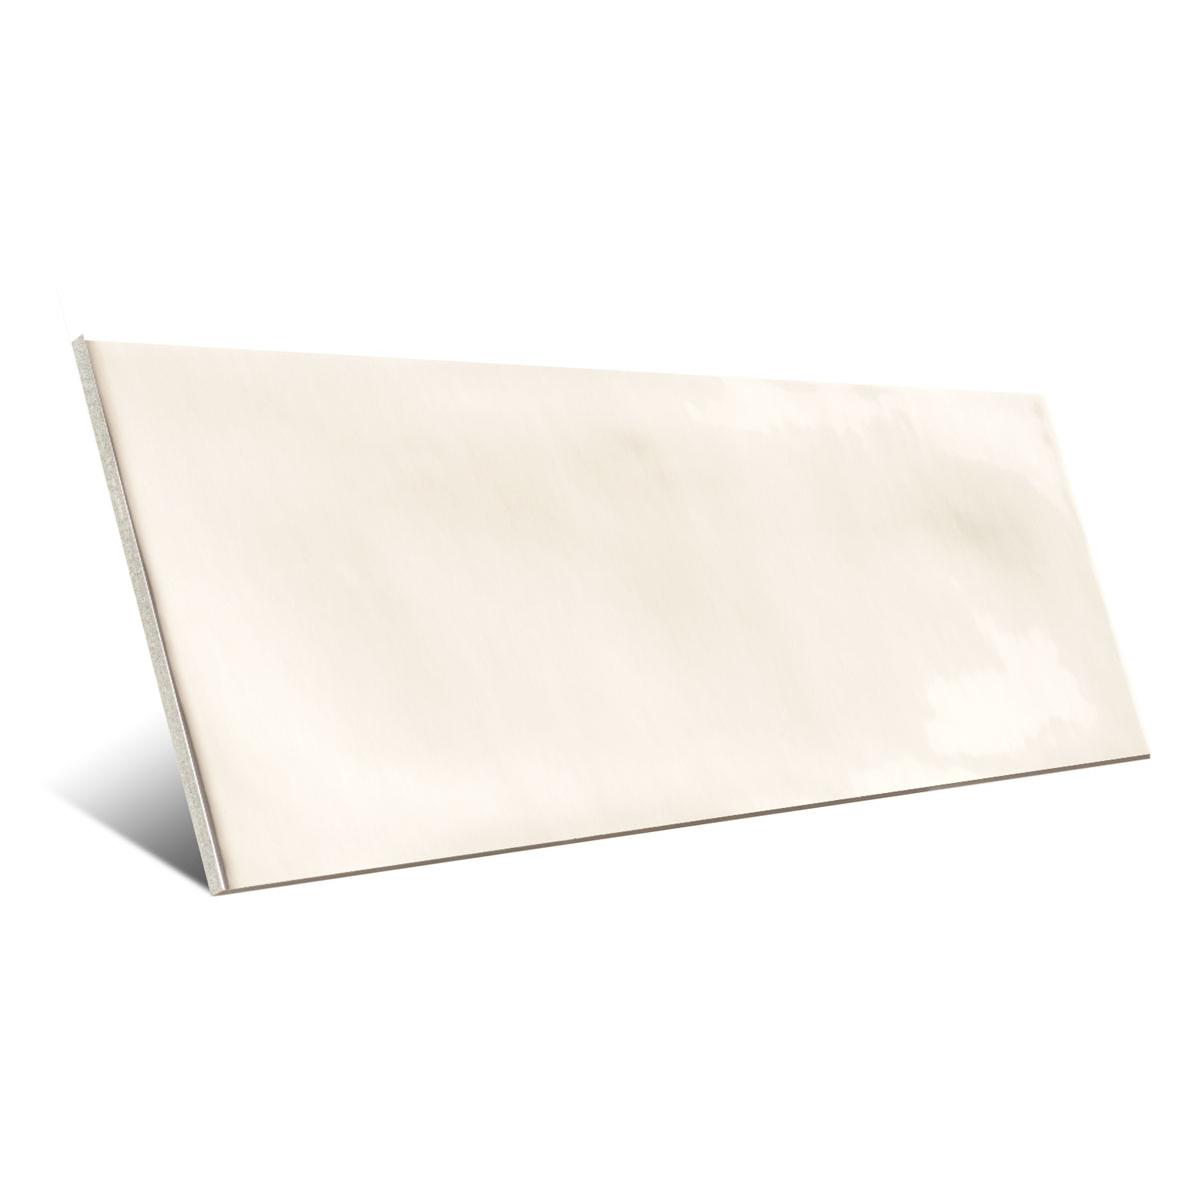 Bulevar Blanco 7,5x15 cm (caja 0.5 m2)